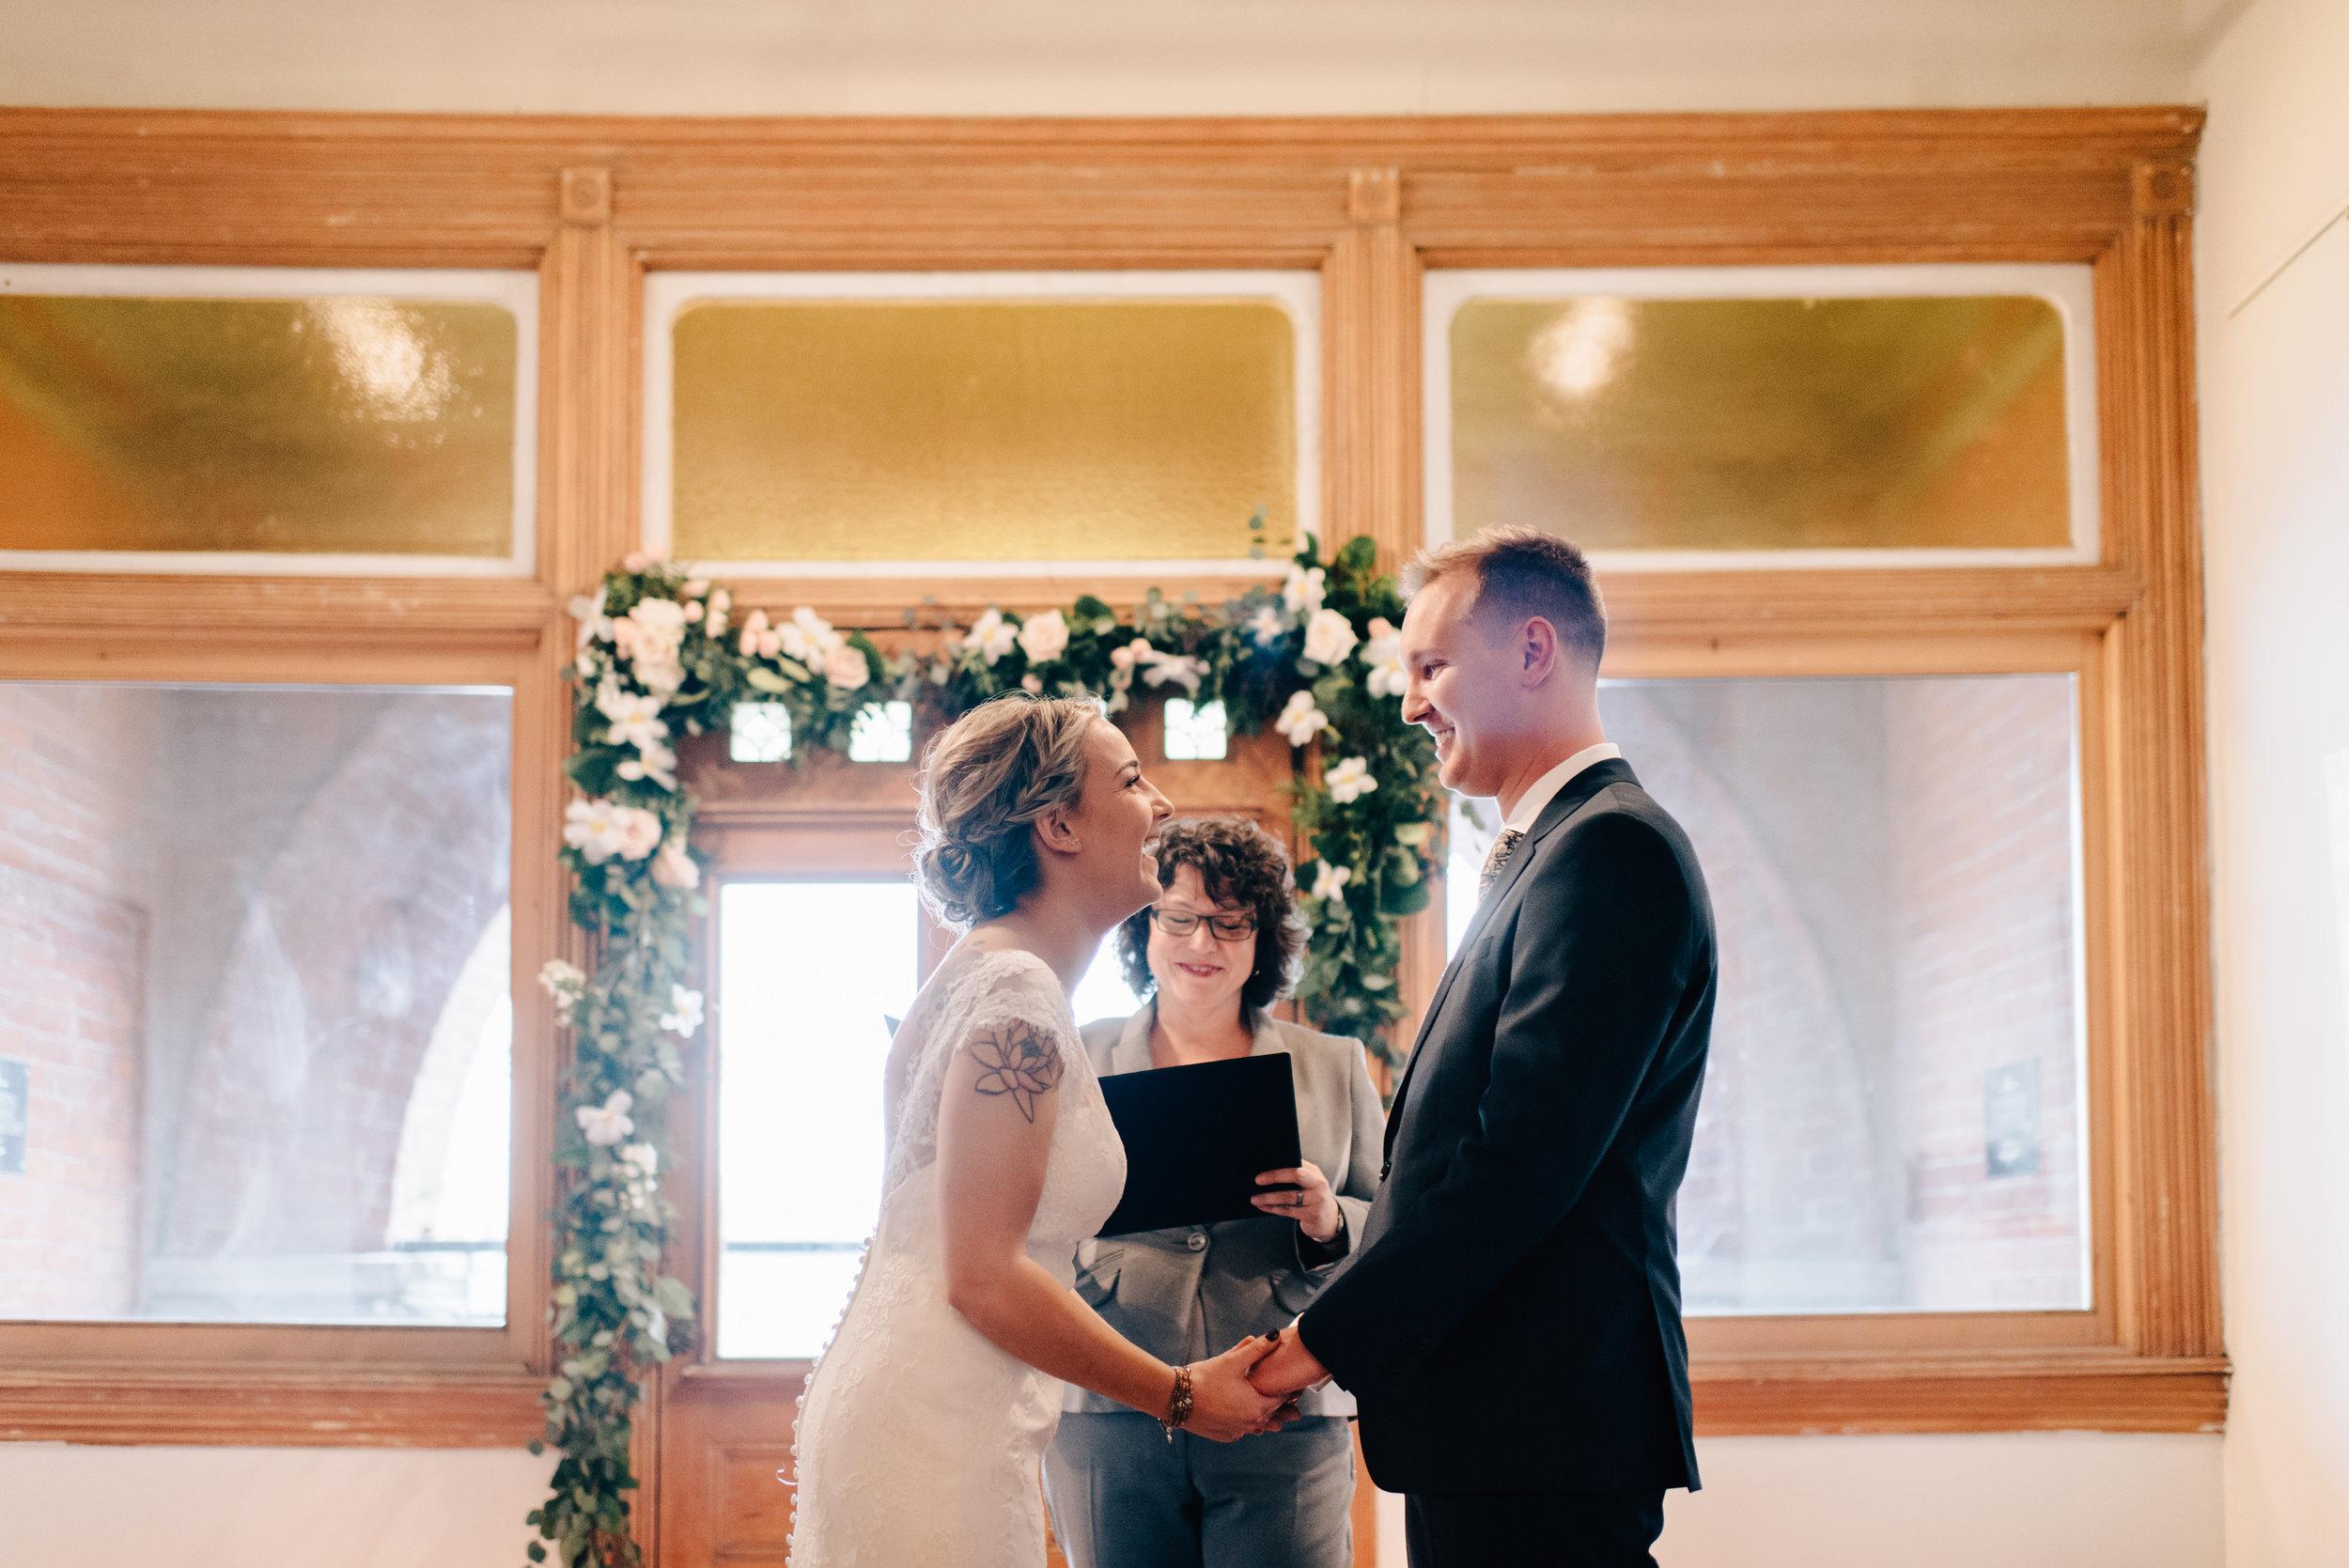 Intimate-Gladstone-Hotel-Wedding-37.jpg